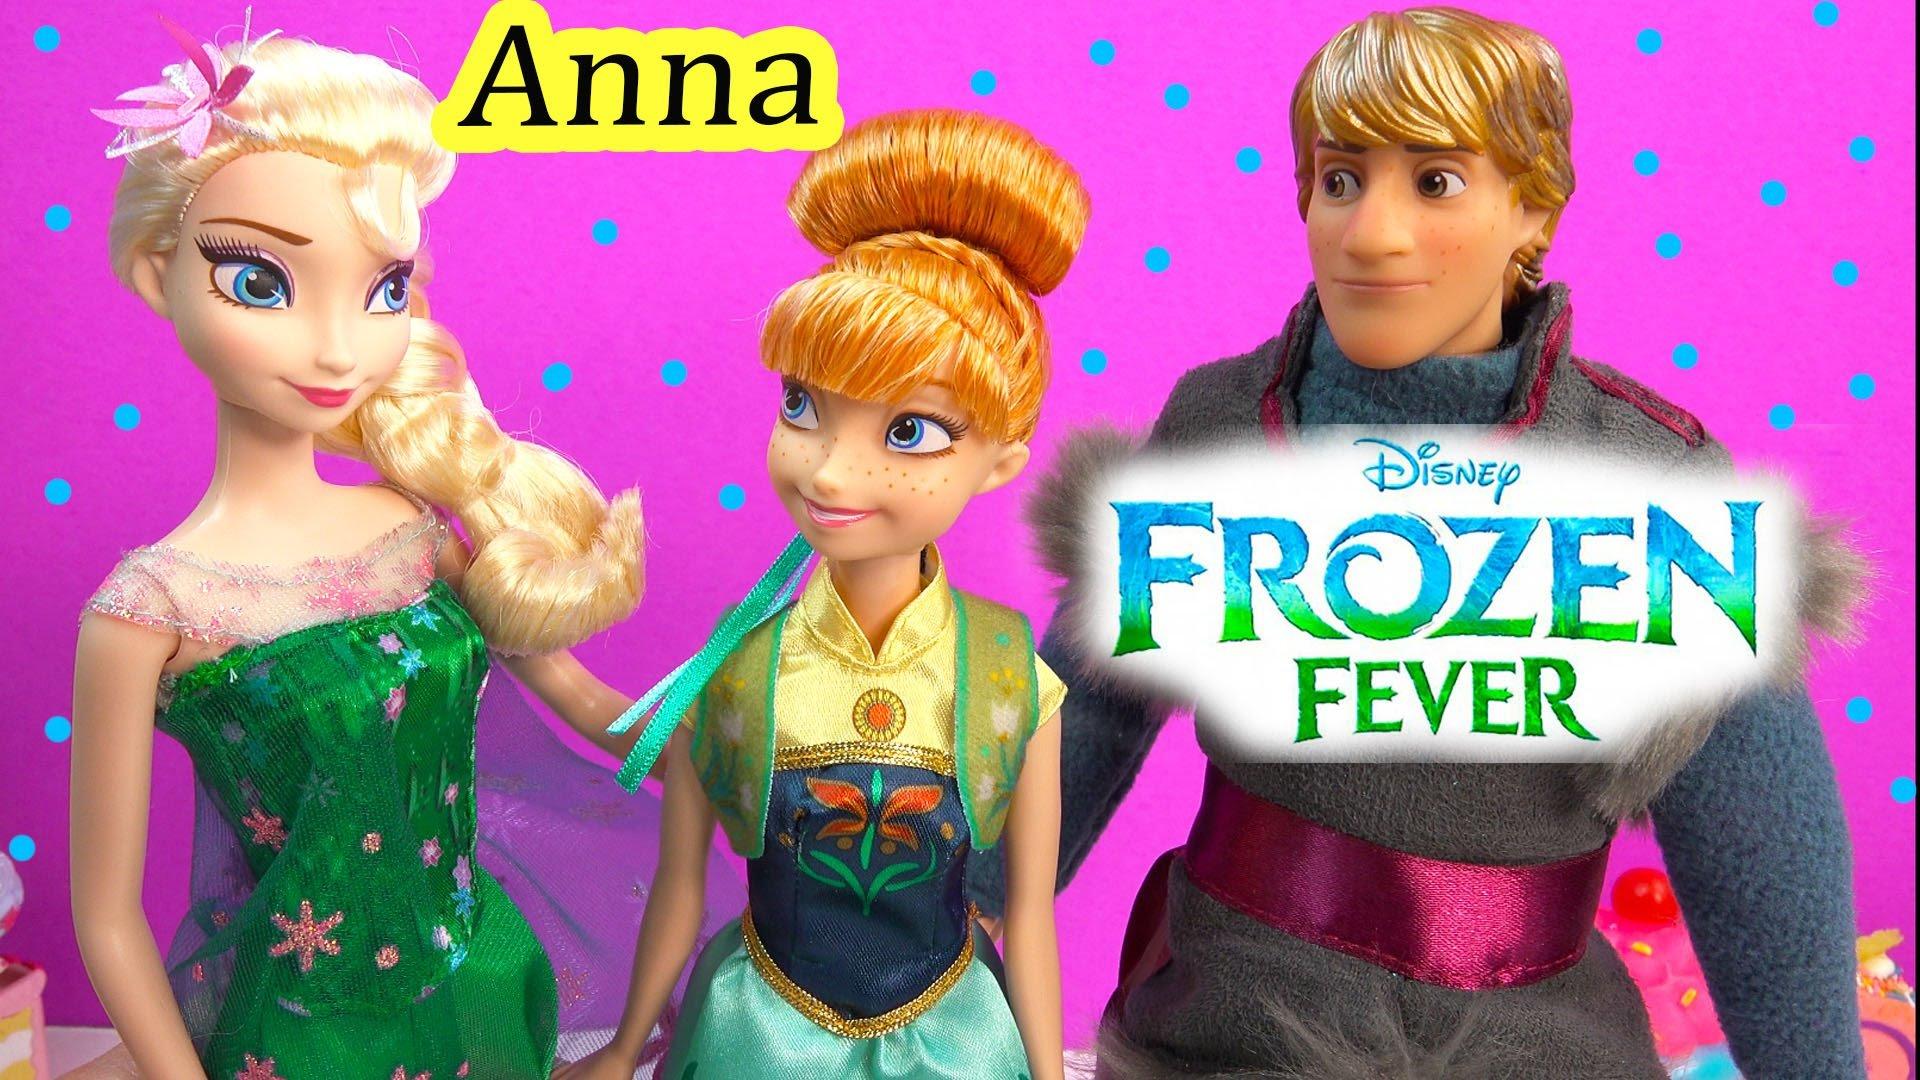 disney frozen fever full movie download hd free